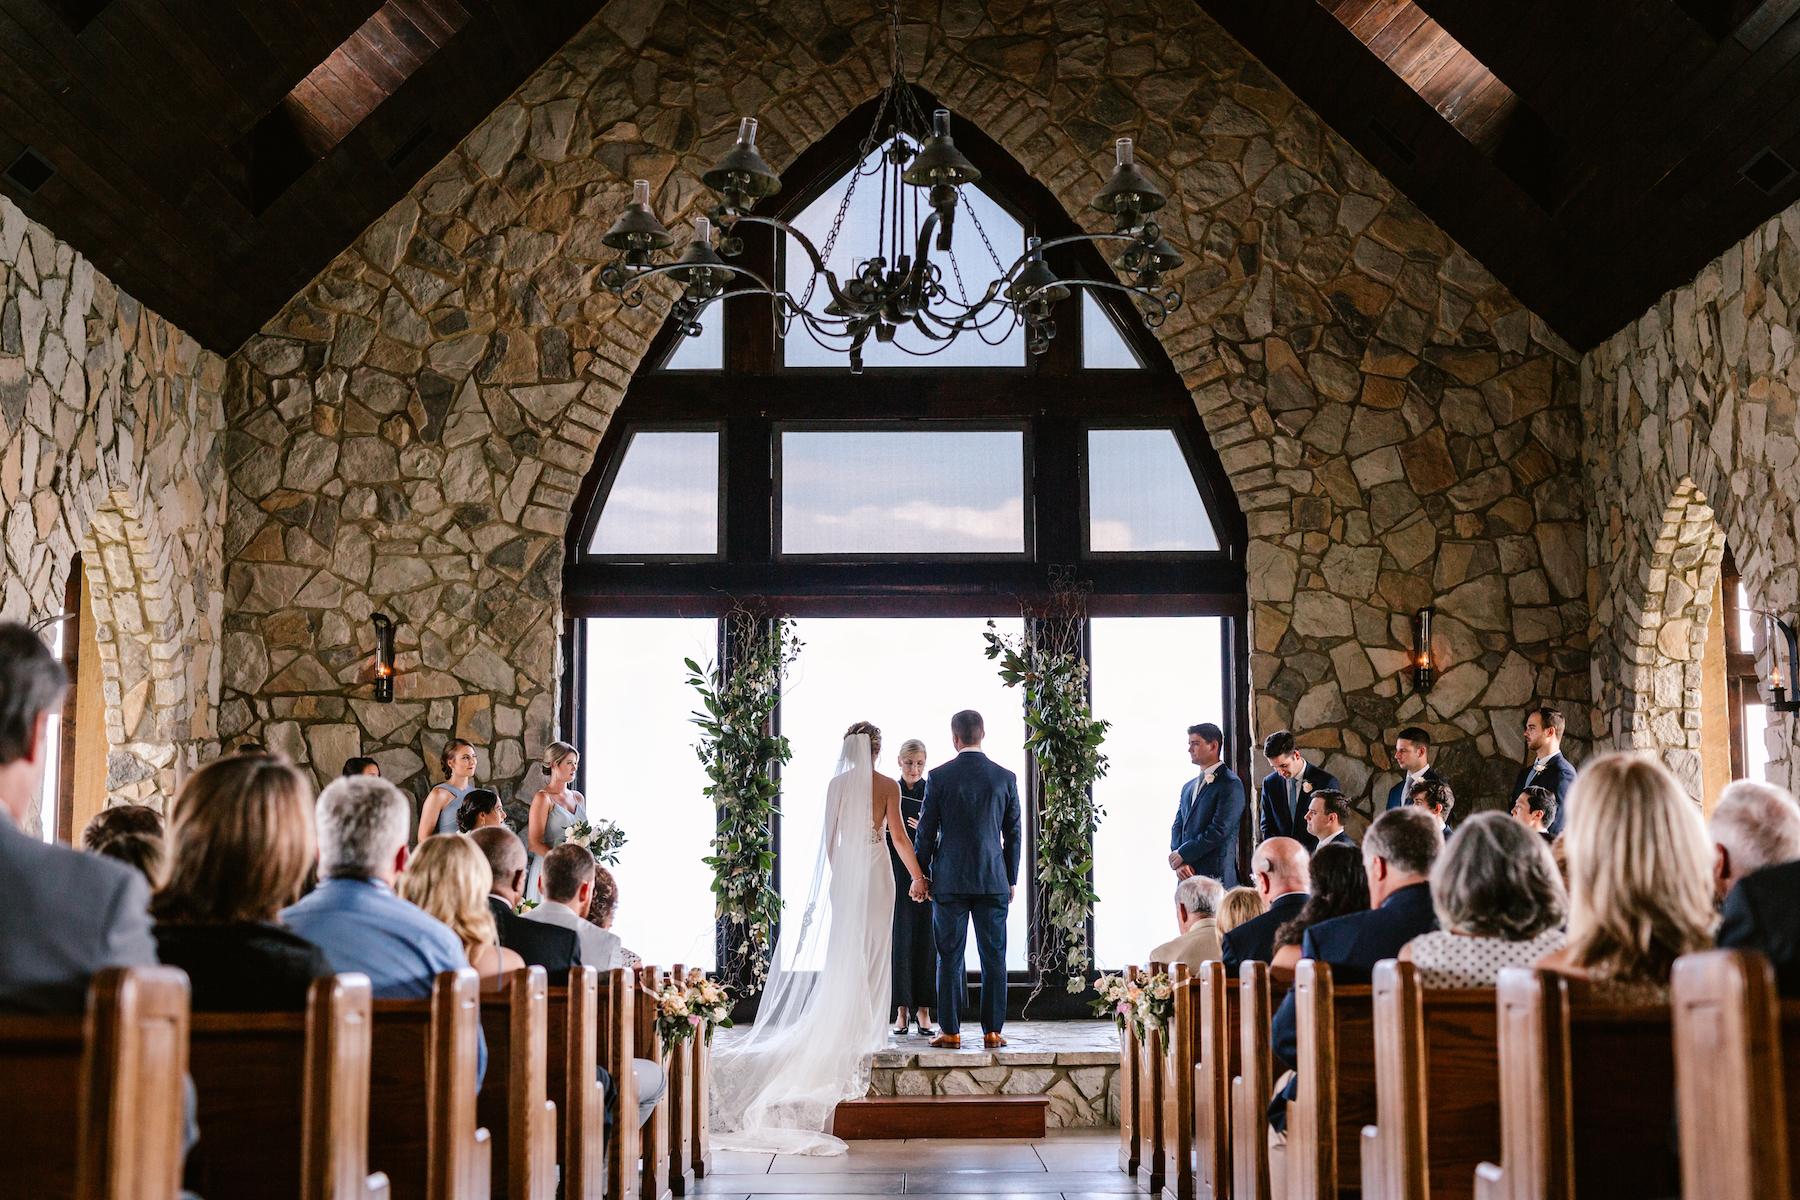 wedding-engagement-photographer-spartanburg-greenville-columbia-carolina-south-north-490.JPG